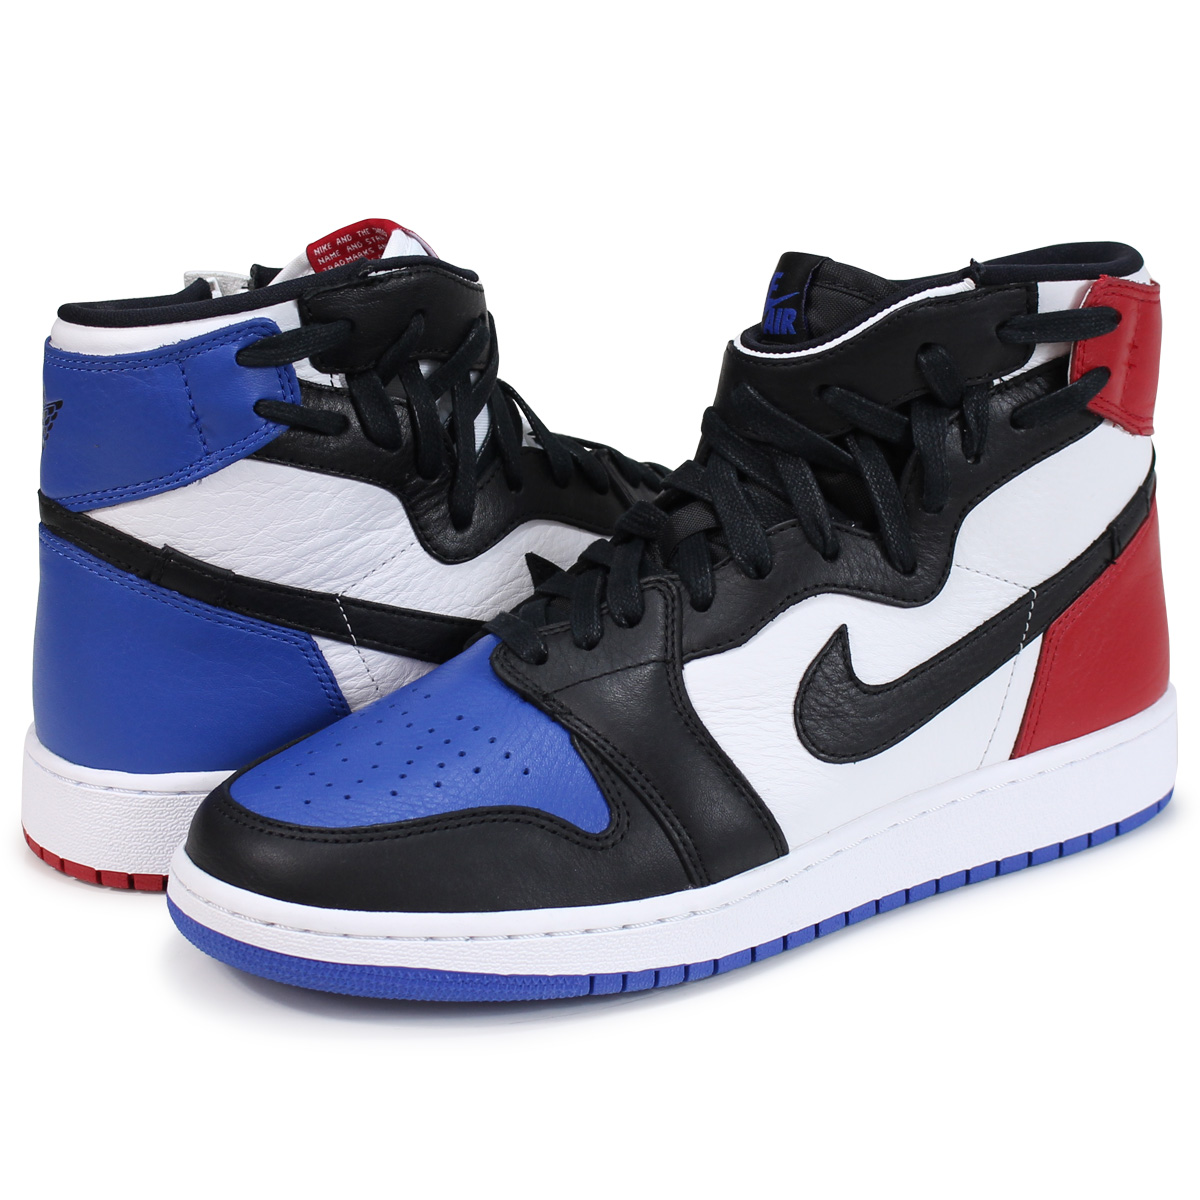 pretty nice 795b8 dc1f4 NIKE WMNS AIR JORDAN 1 REBEL XX OG Nike Air Jordan 1 nostalgic sneakers  Lady's AT4151-001 black [load planned Shinnyu load in reservation product  6/29 ...